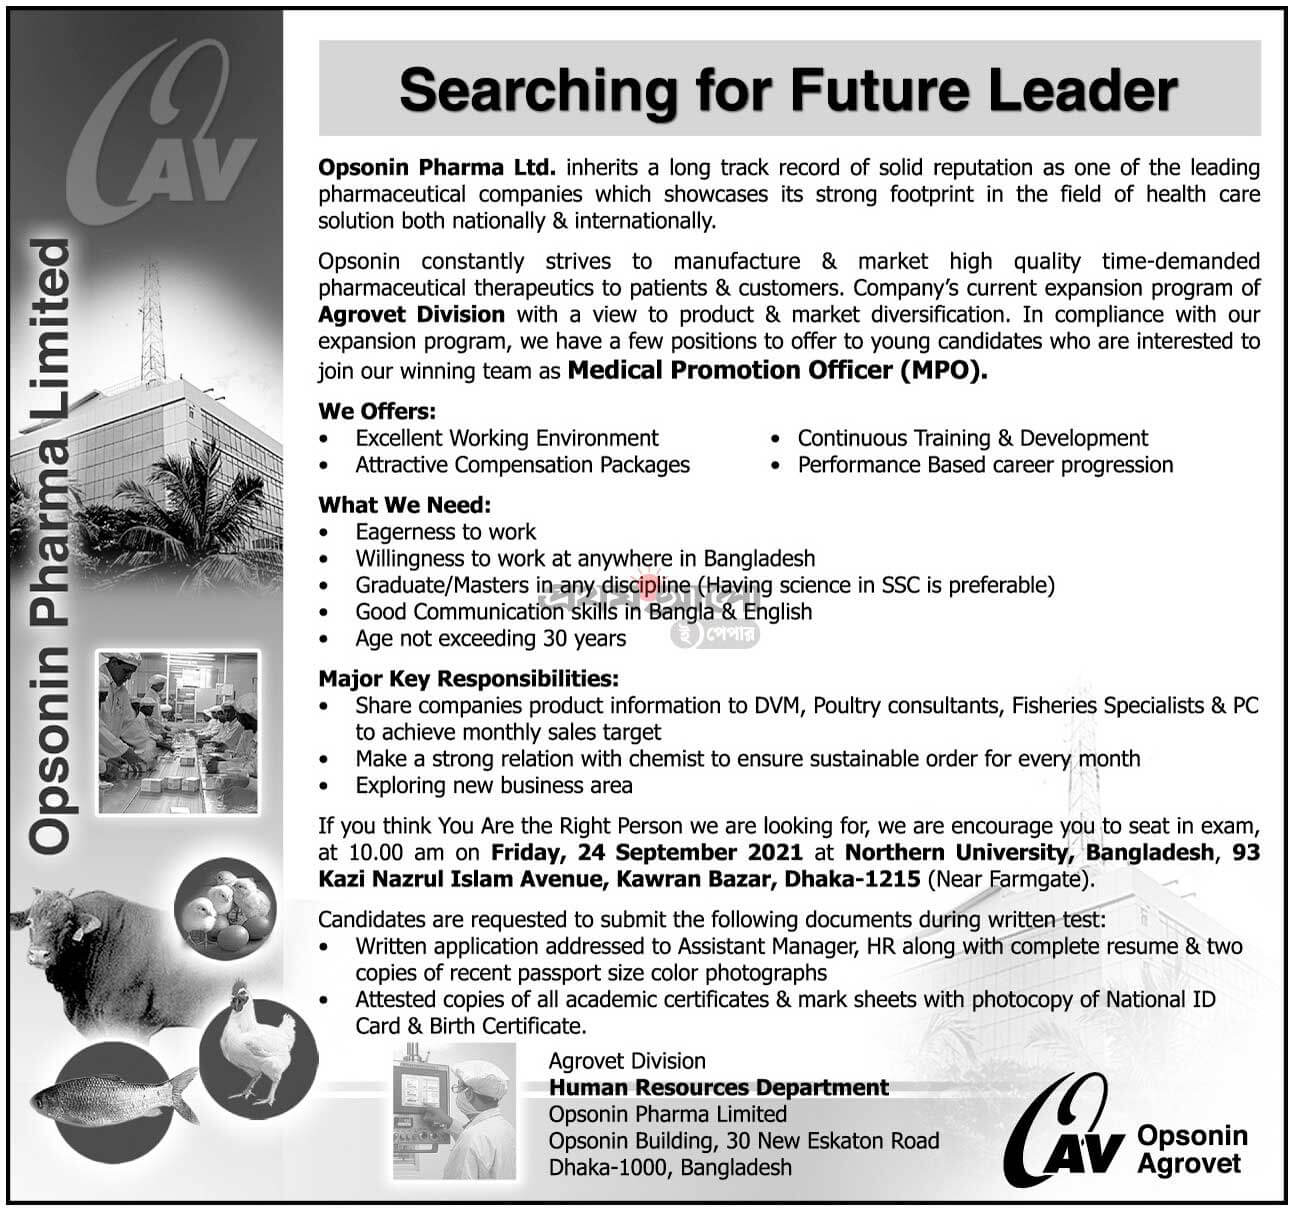 Opsonin Pharma Job Circular image 2021